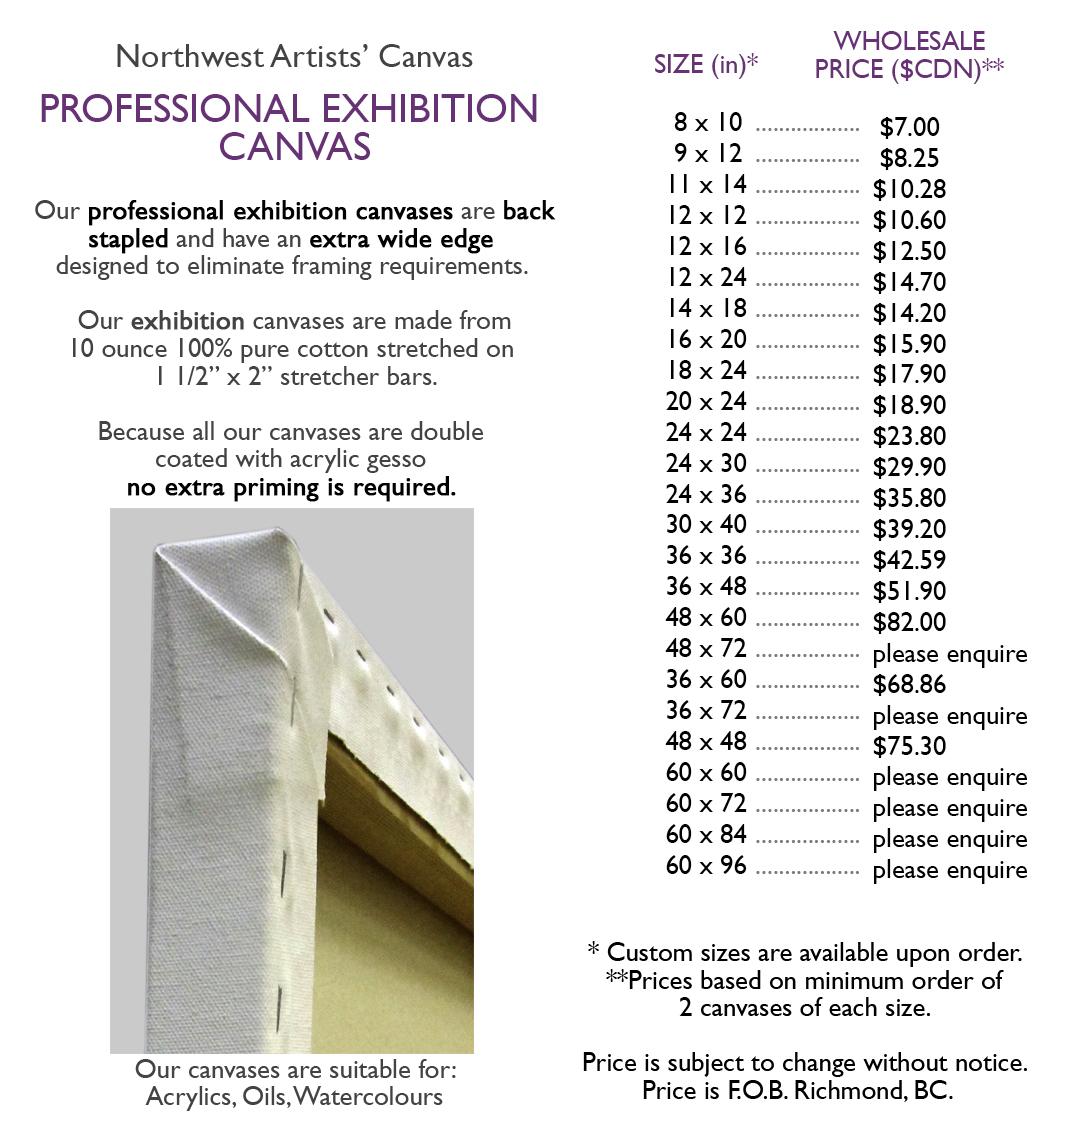 Professional Exhibition Canvas   Northwest Artists' Canvas